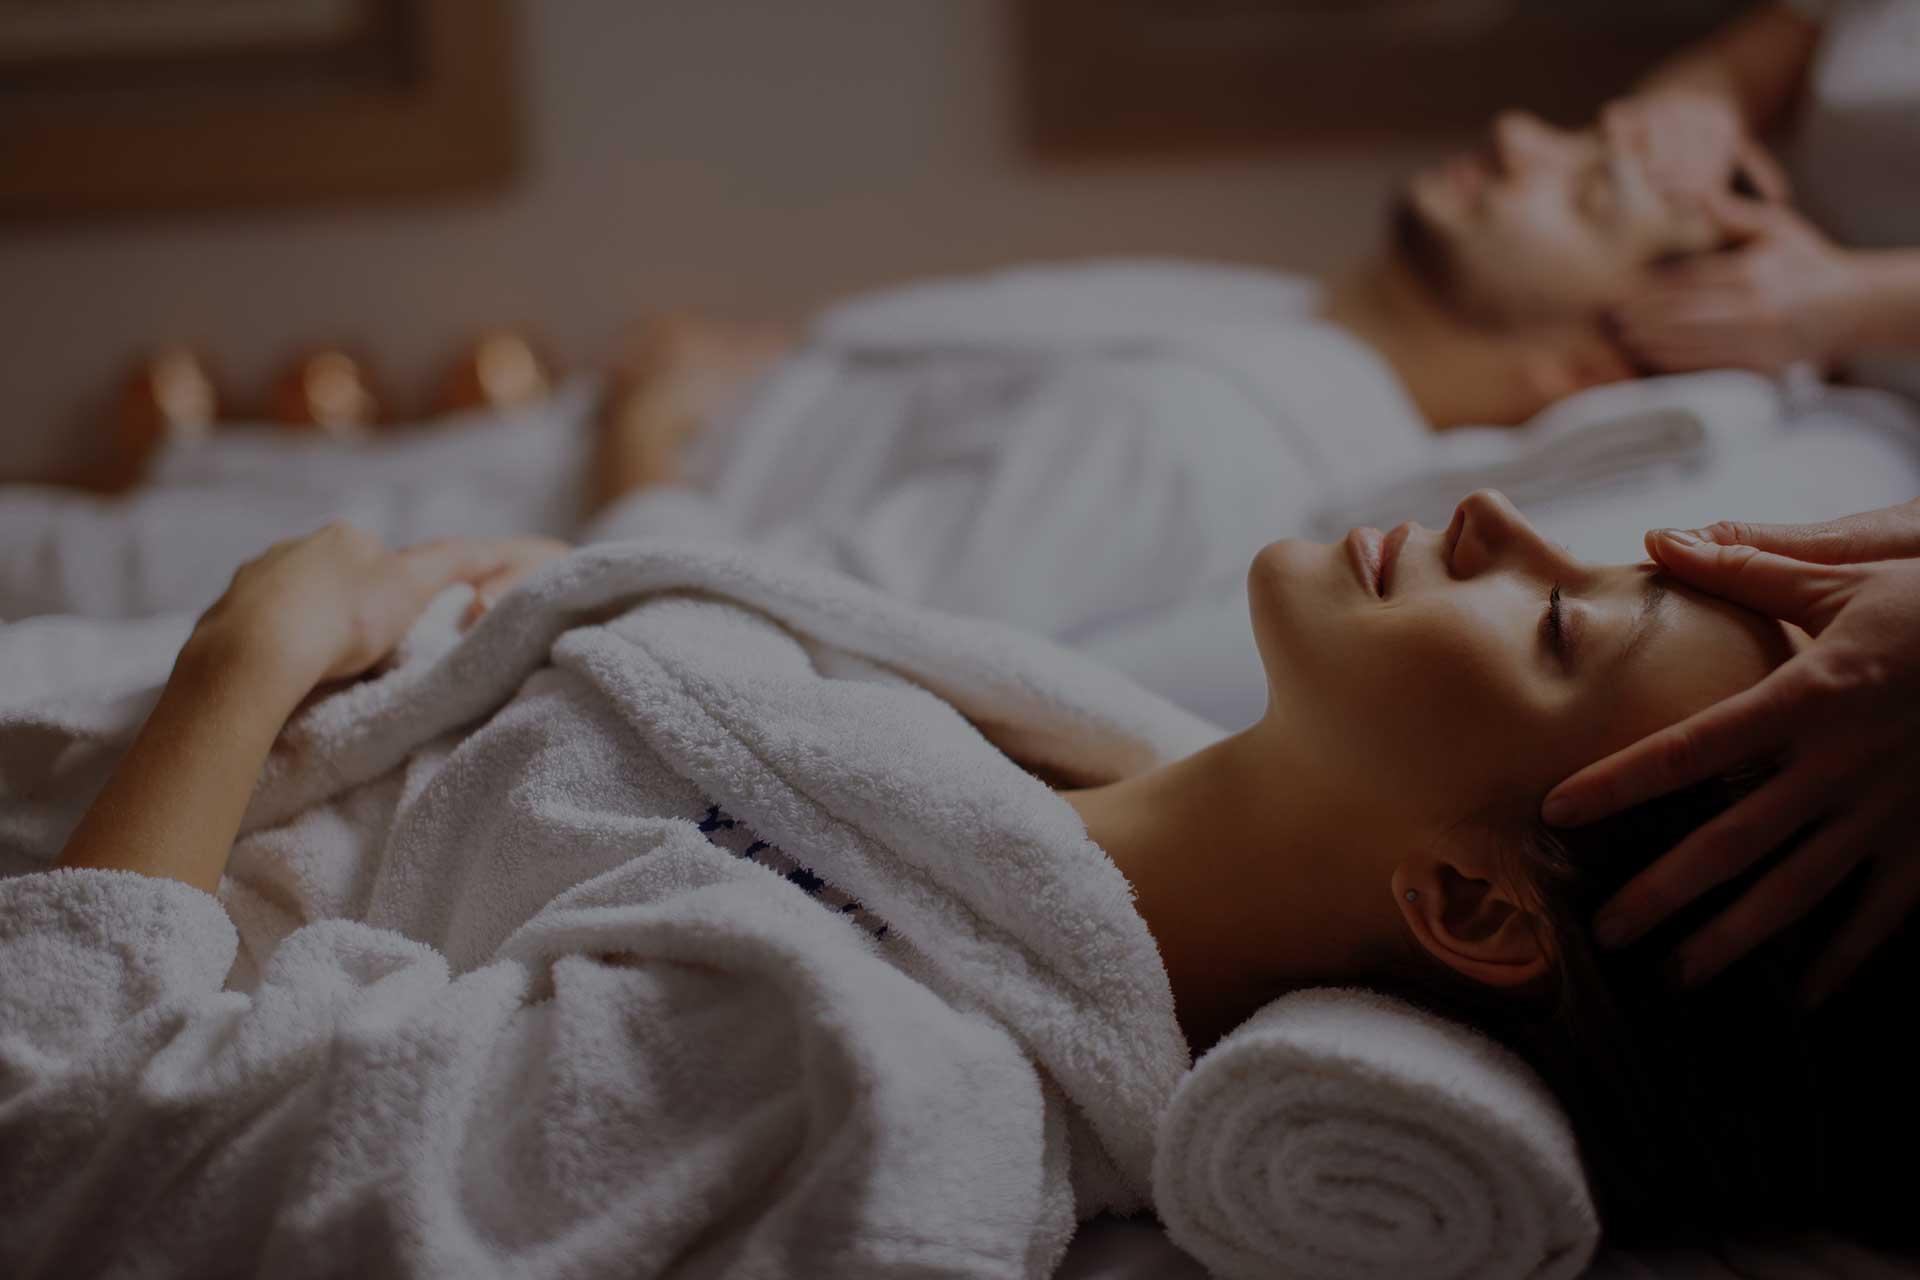 soins esthetiques corps visage duo couple mere fille relaxation detente institut beaute auch gers 32